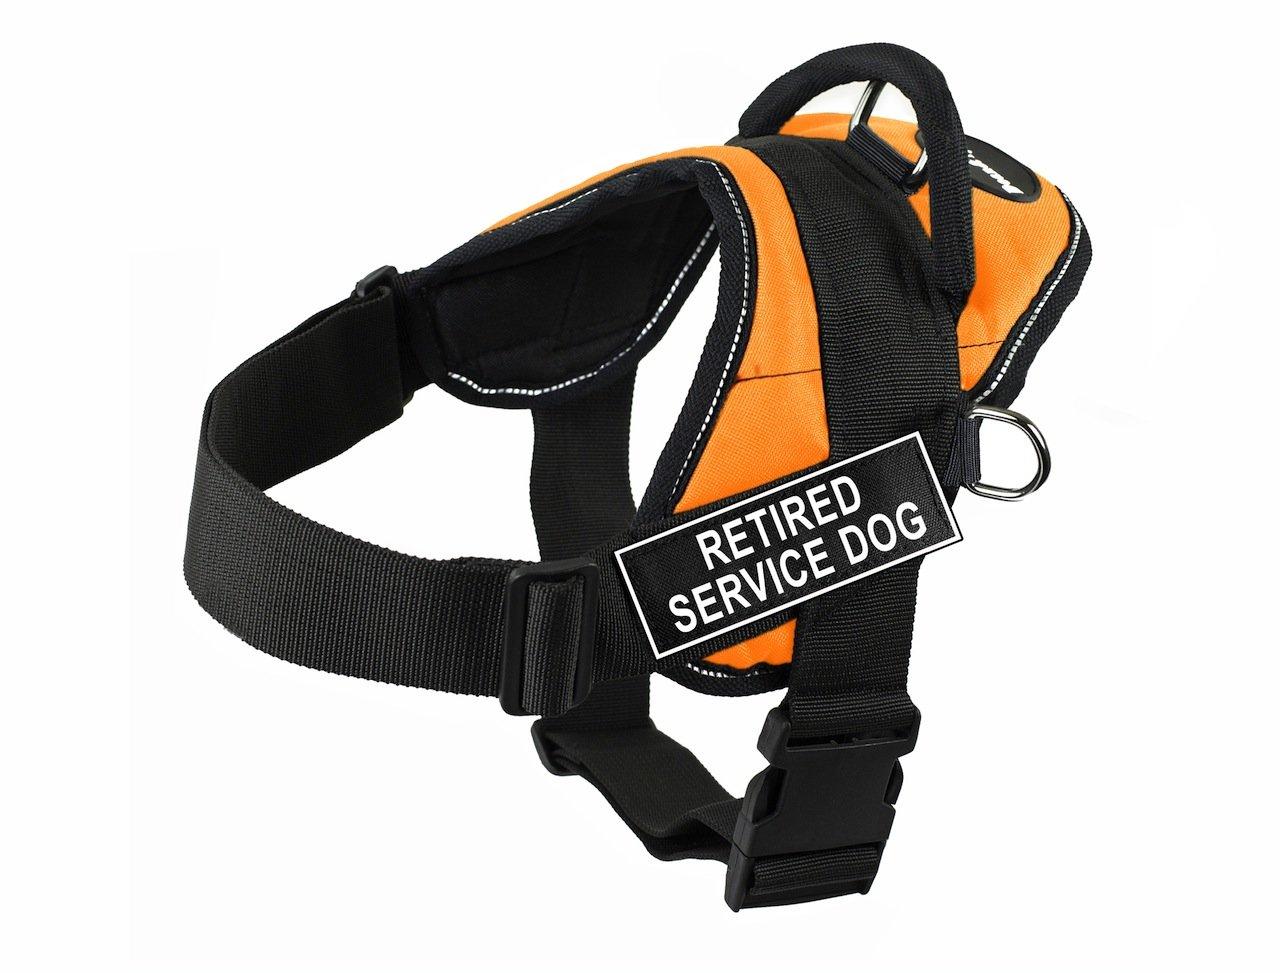 Dean & Tyler DT Fun Retired Service Dog Harness with Reflective Trim, XX-Small, orange